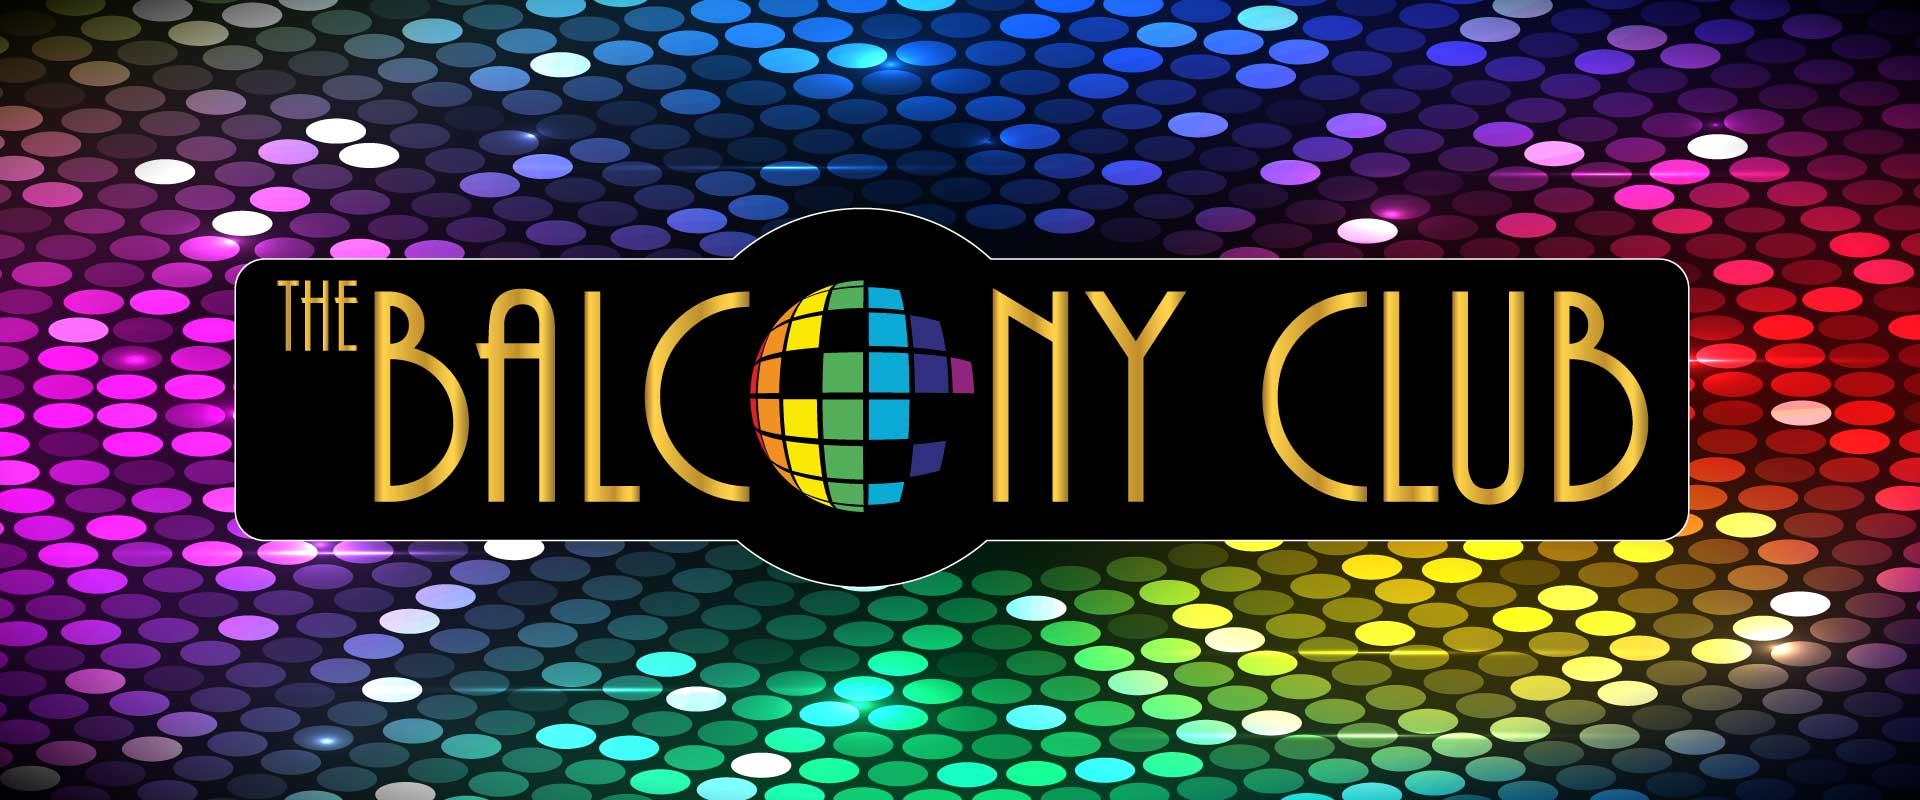 The Balcony Club - Slider - Logo